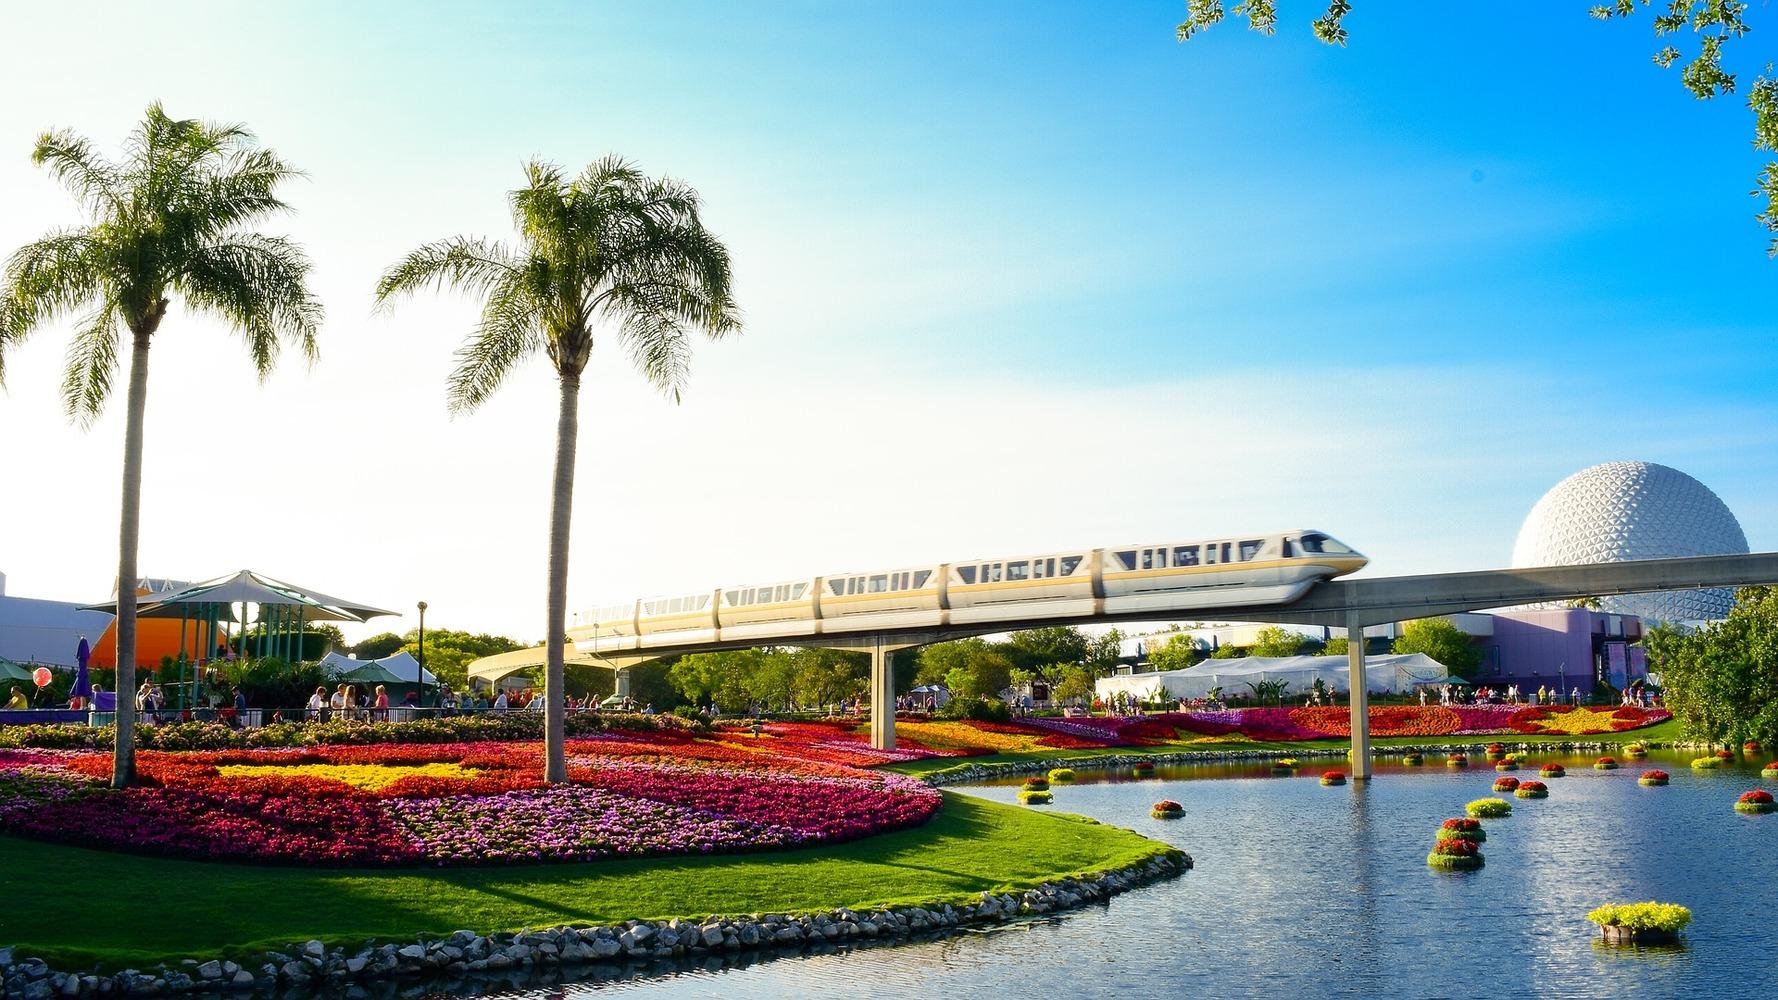 Image of Orlando International Airport in Orlando Florida